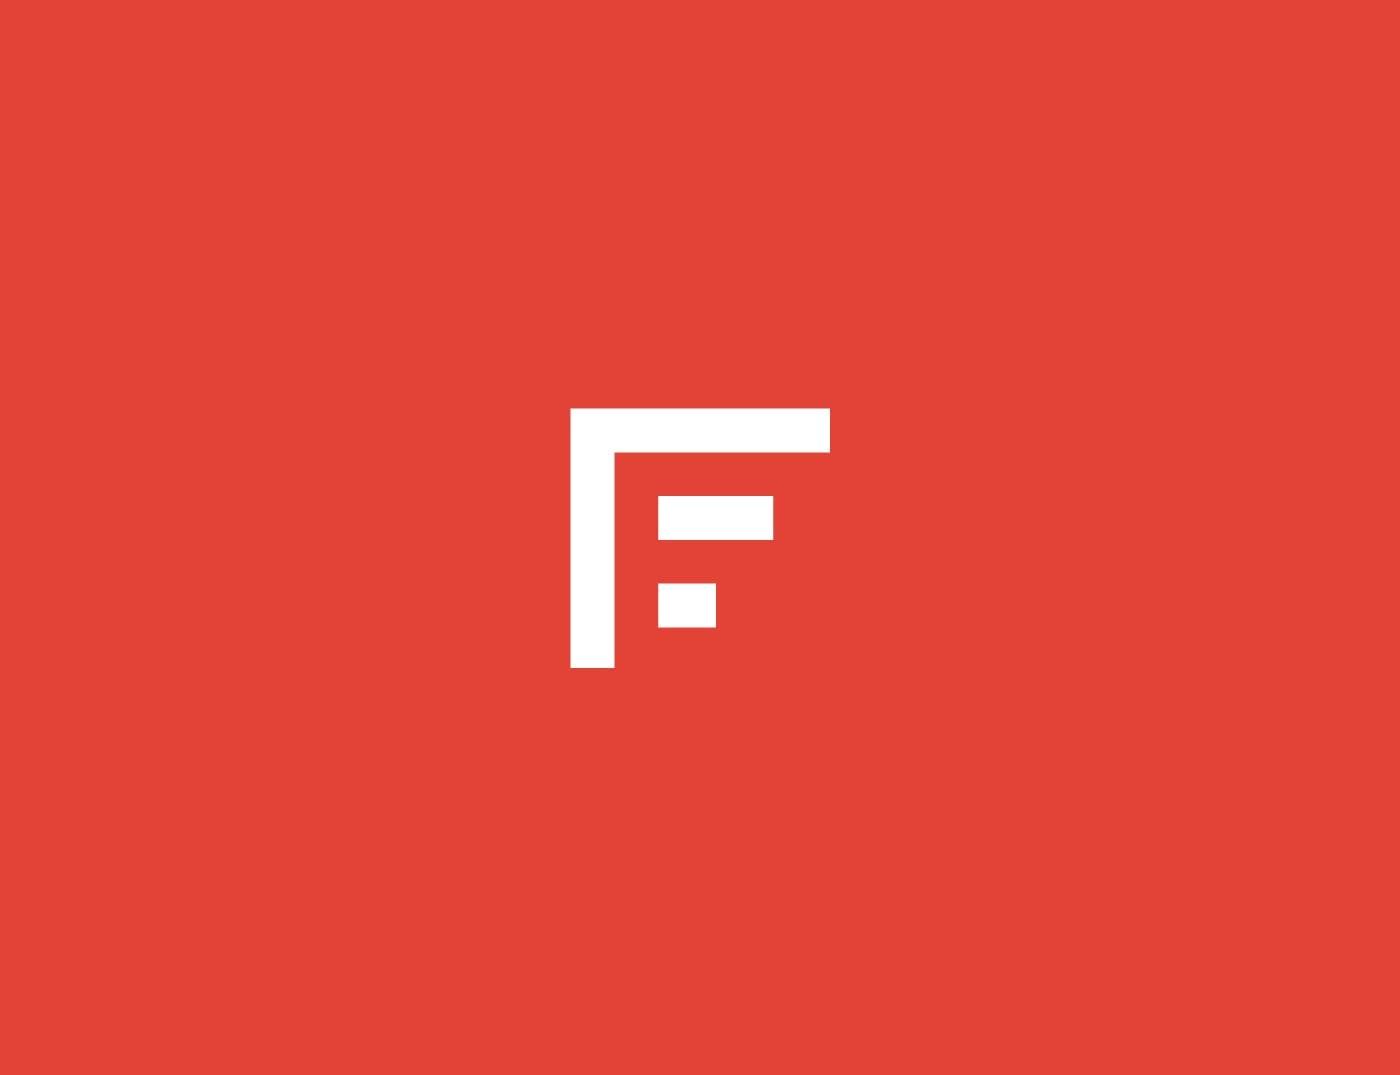 FRANK FURNITURE Branding and Identity Design